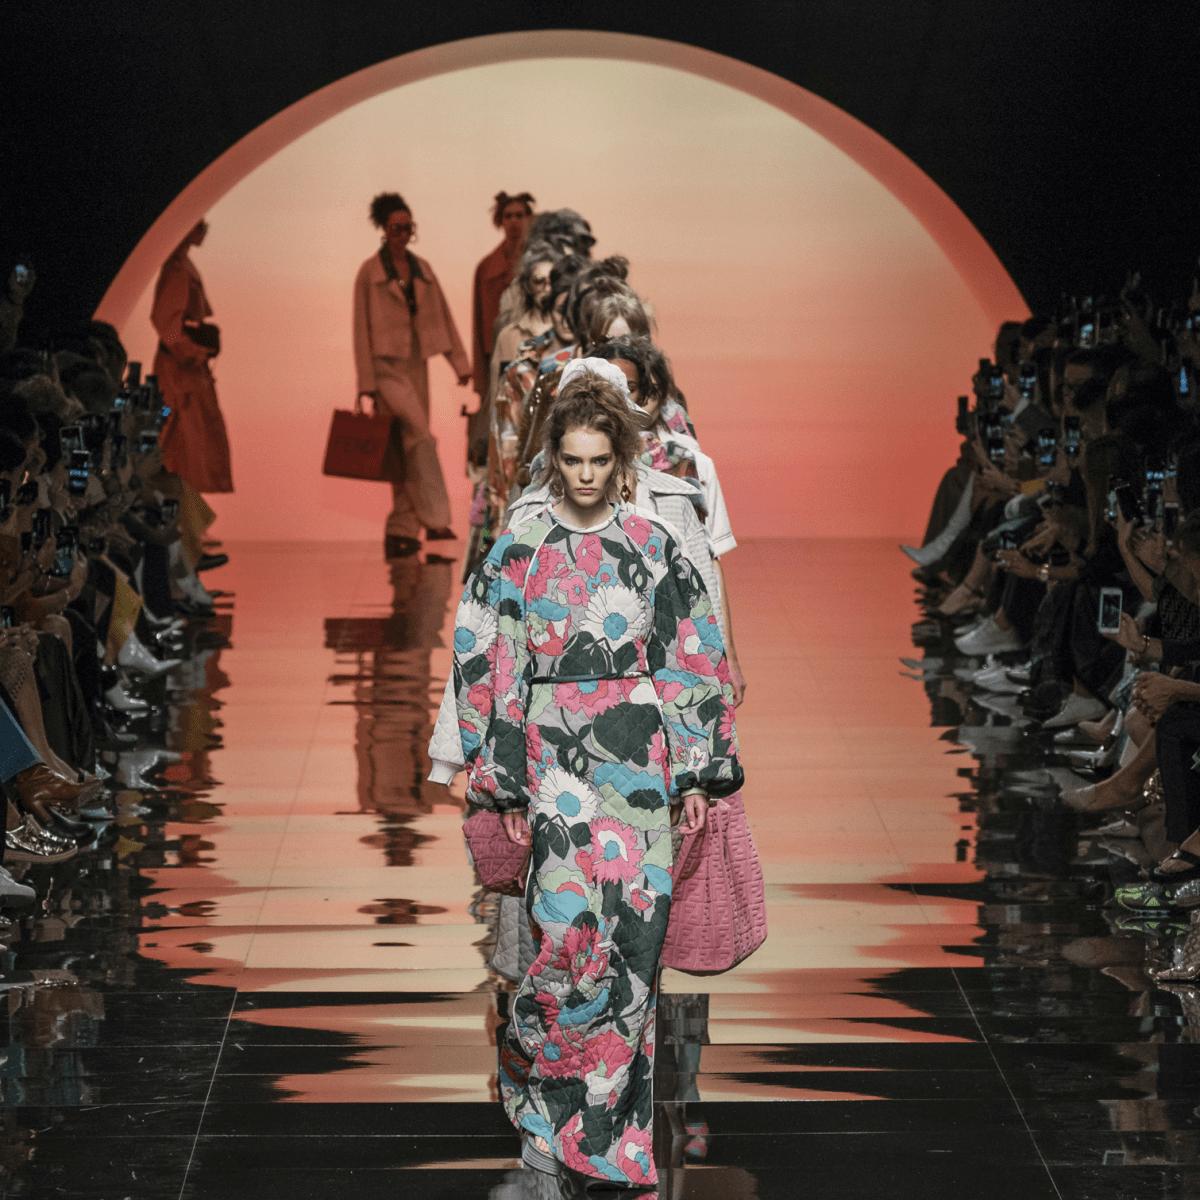 Silvia Venturini Fendi Makes Her Ready To Wear Debut At Fendi For Spring 2020 Fashionista